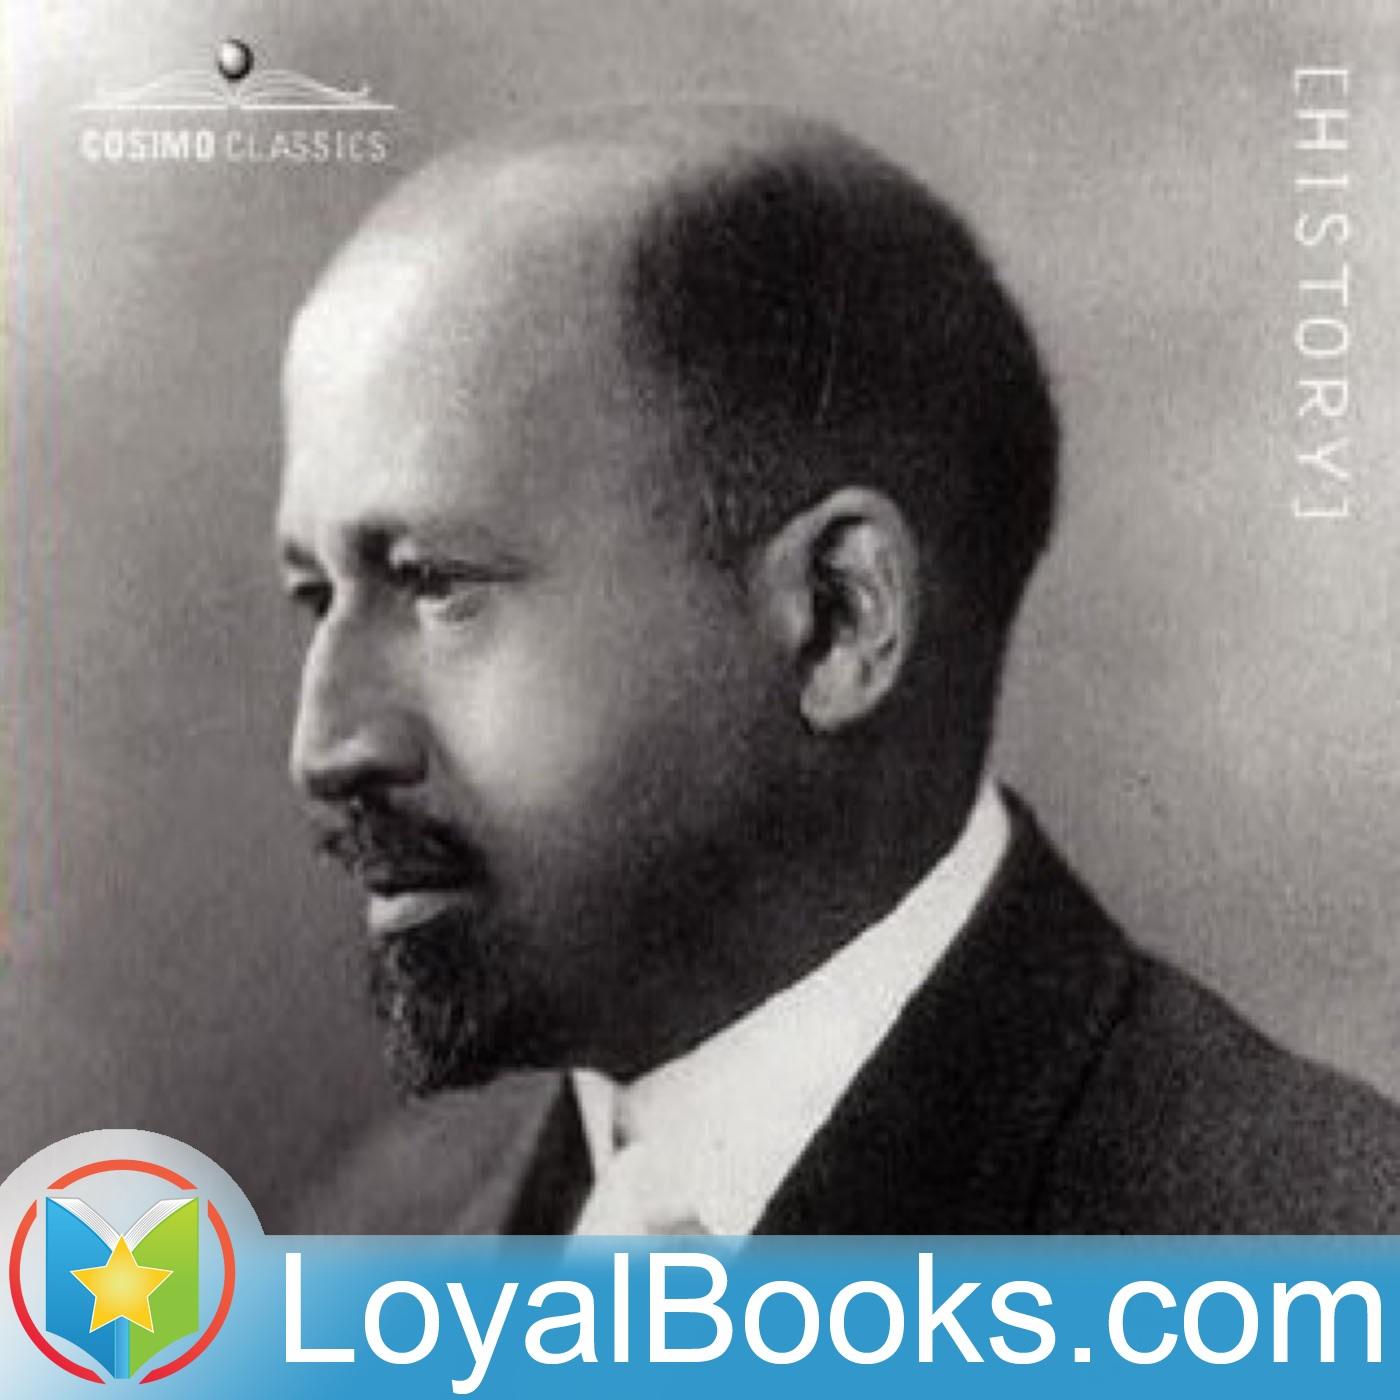 <![CDATA[The Souls of Black Folk by William E. B. Du Bois]]>